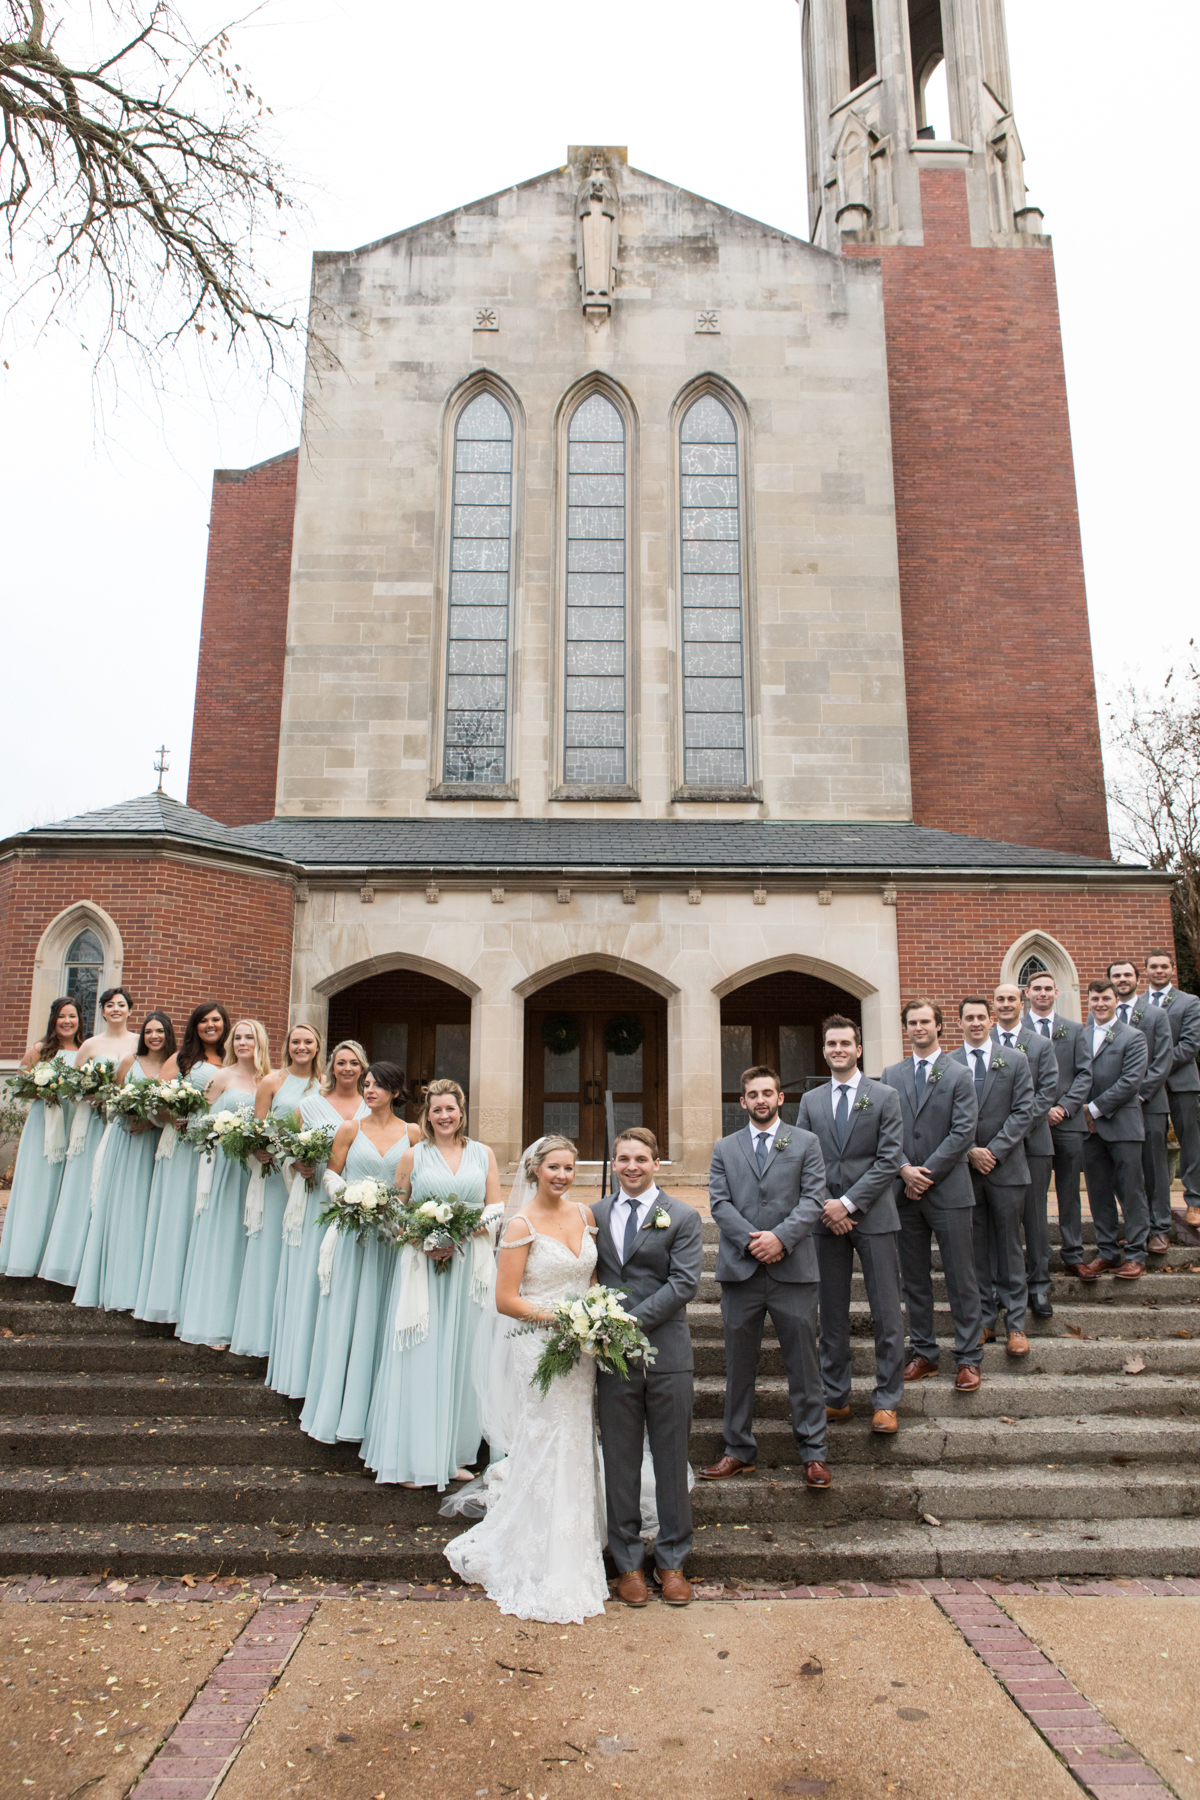 Kelli-and-Matt-Nashville-Wedding-Sneak-Peak-0146.jpg